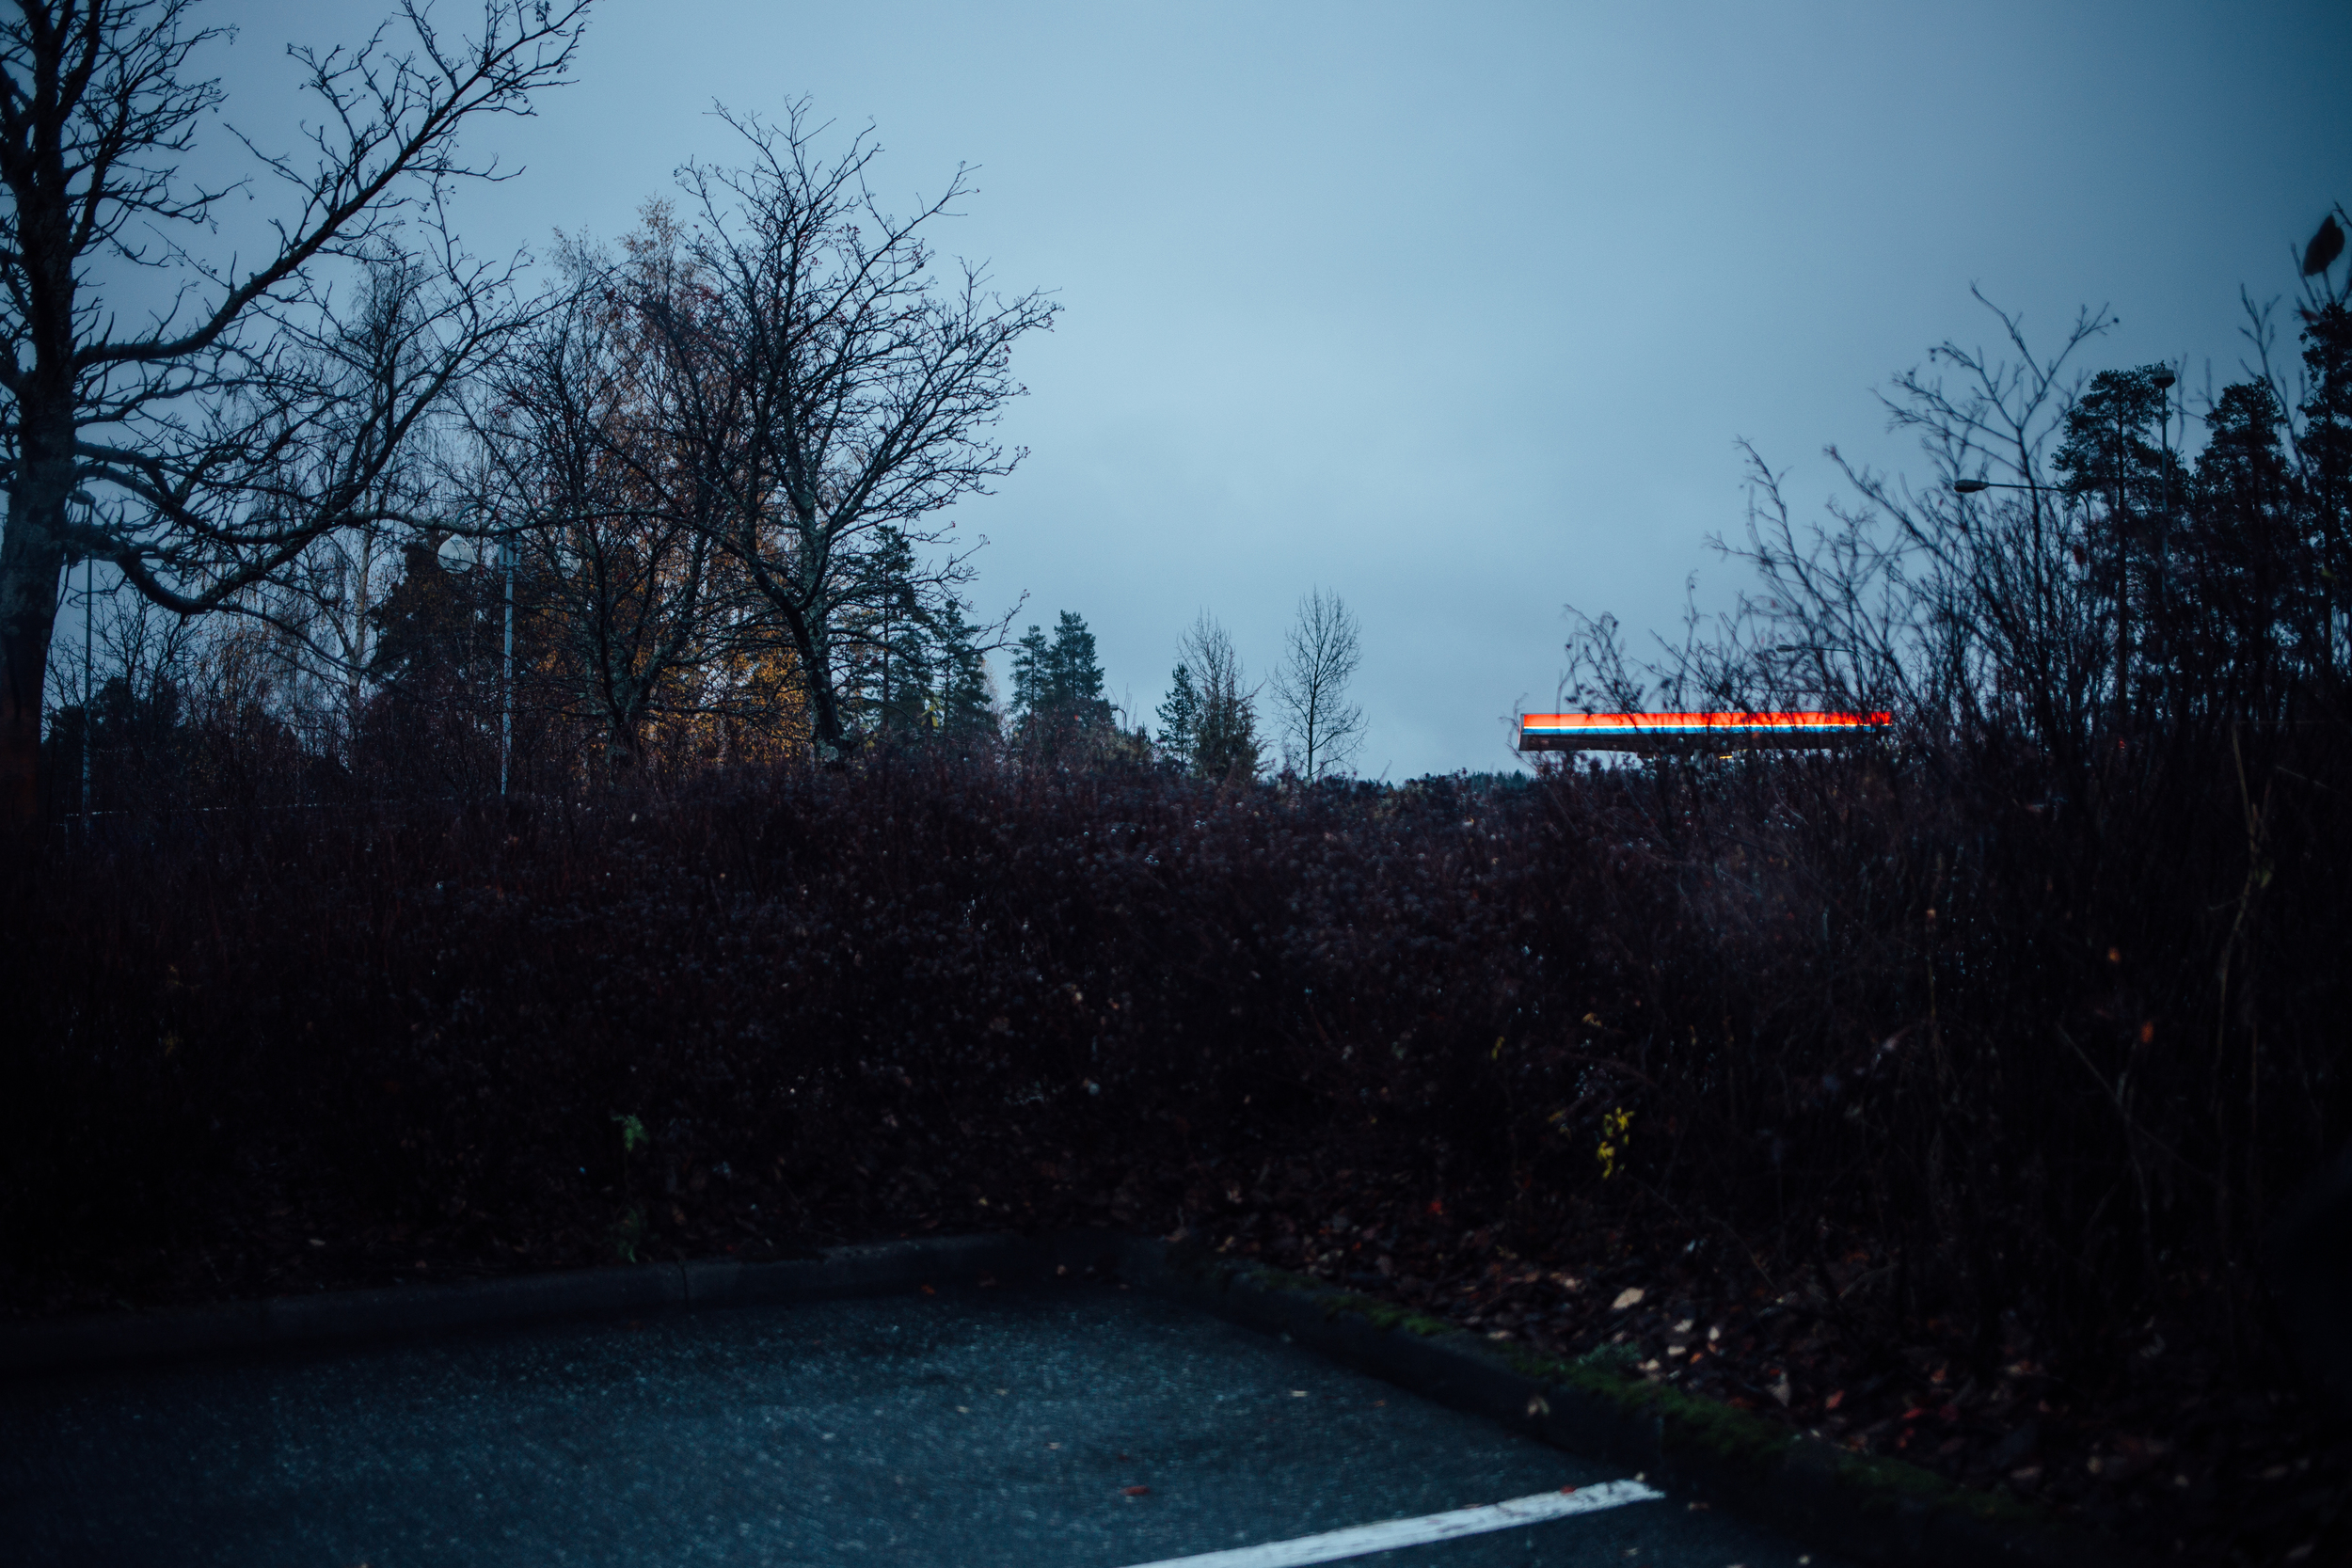 Heinola, Finland, November 2015